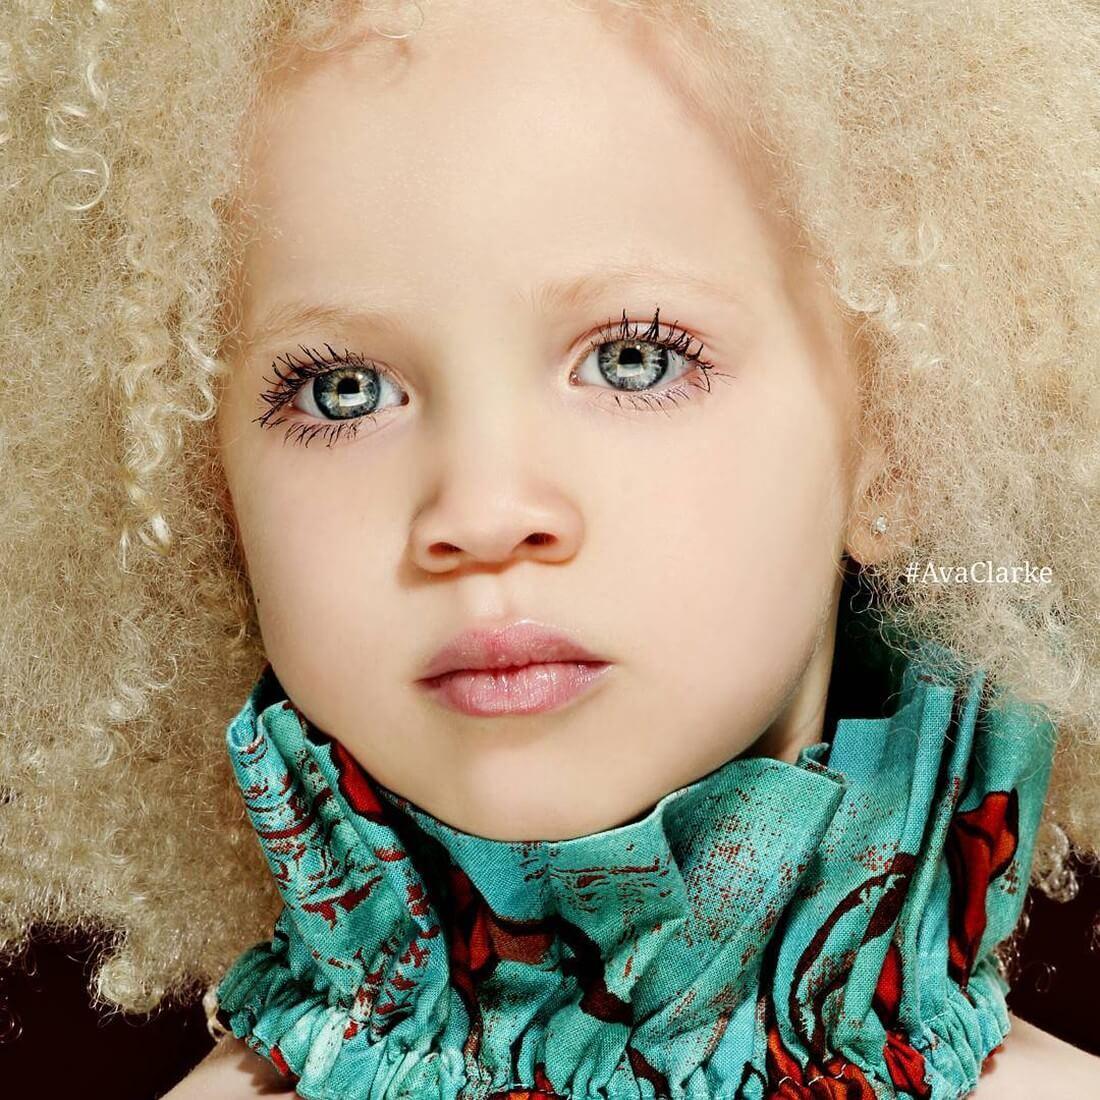 model-albinos-ava-clarke-1